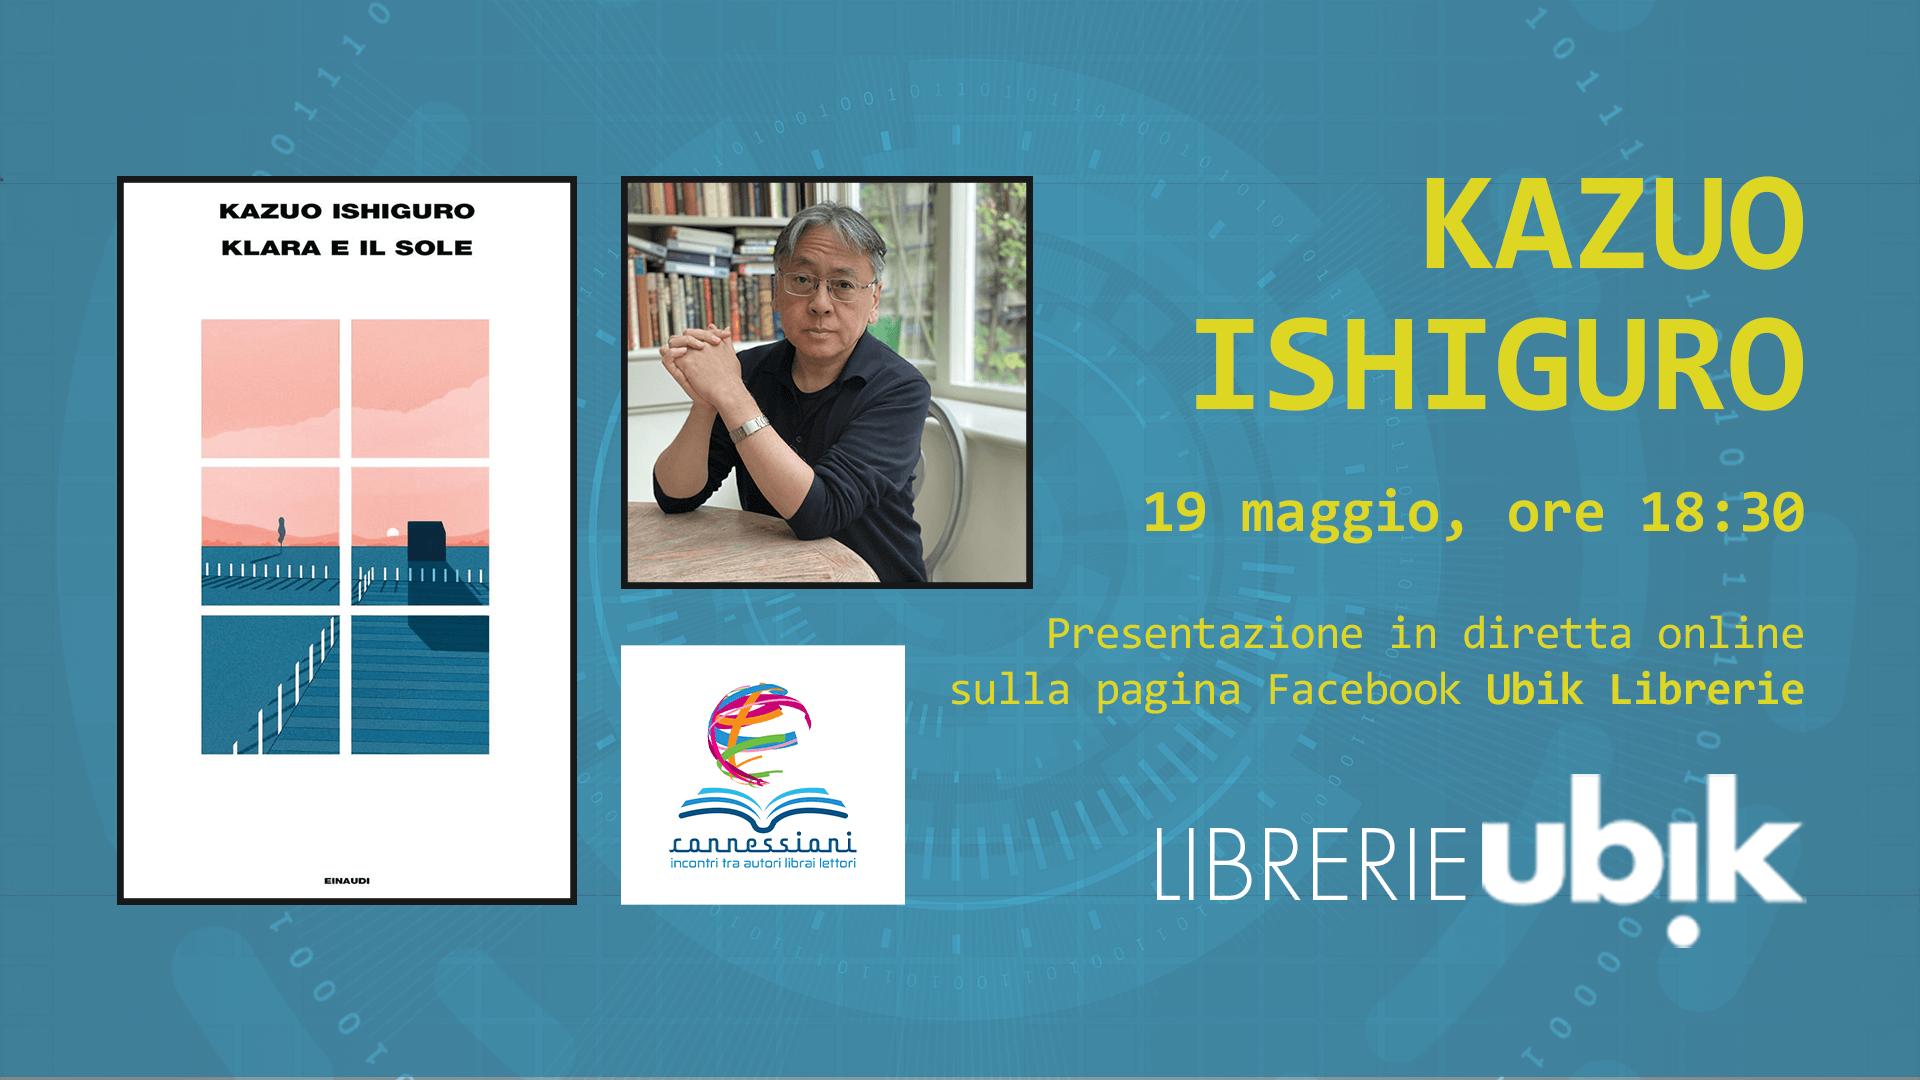 KAZUO ISHIGURO presenta in diretta online